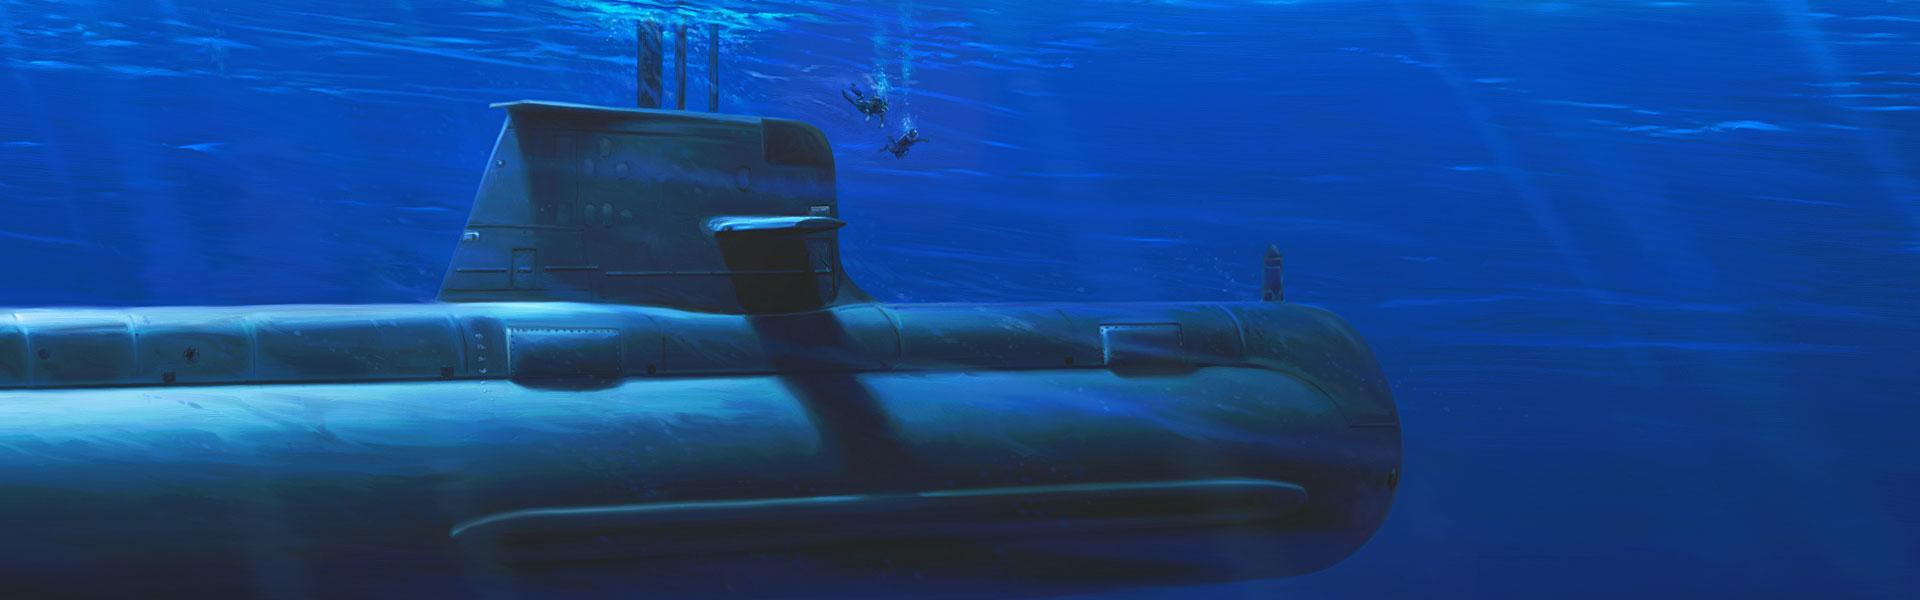 HMAS-Collins-Collins-Class-slider